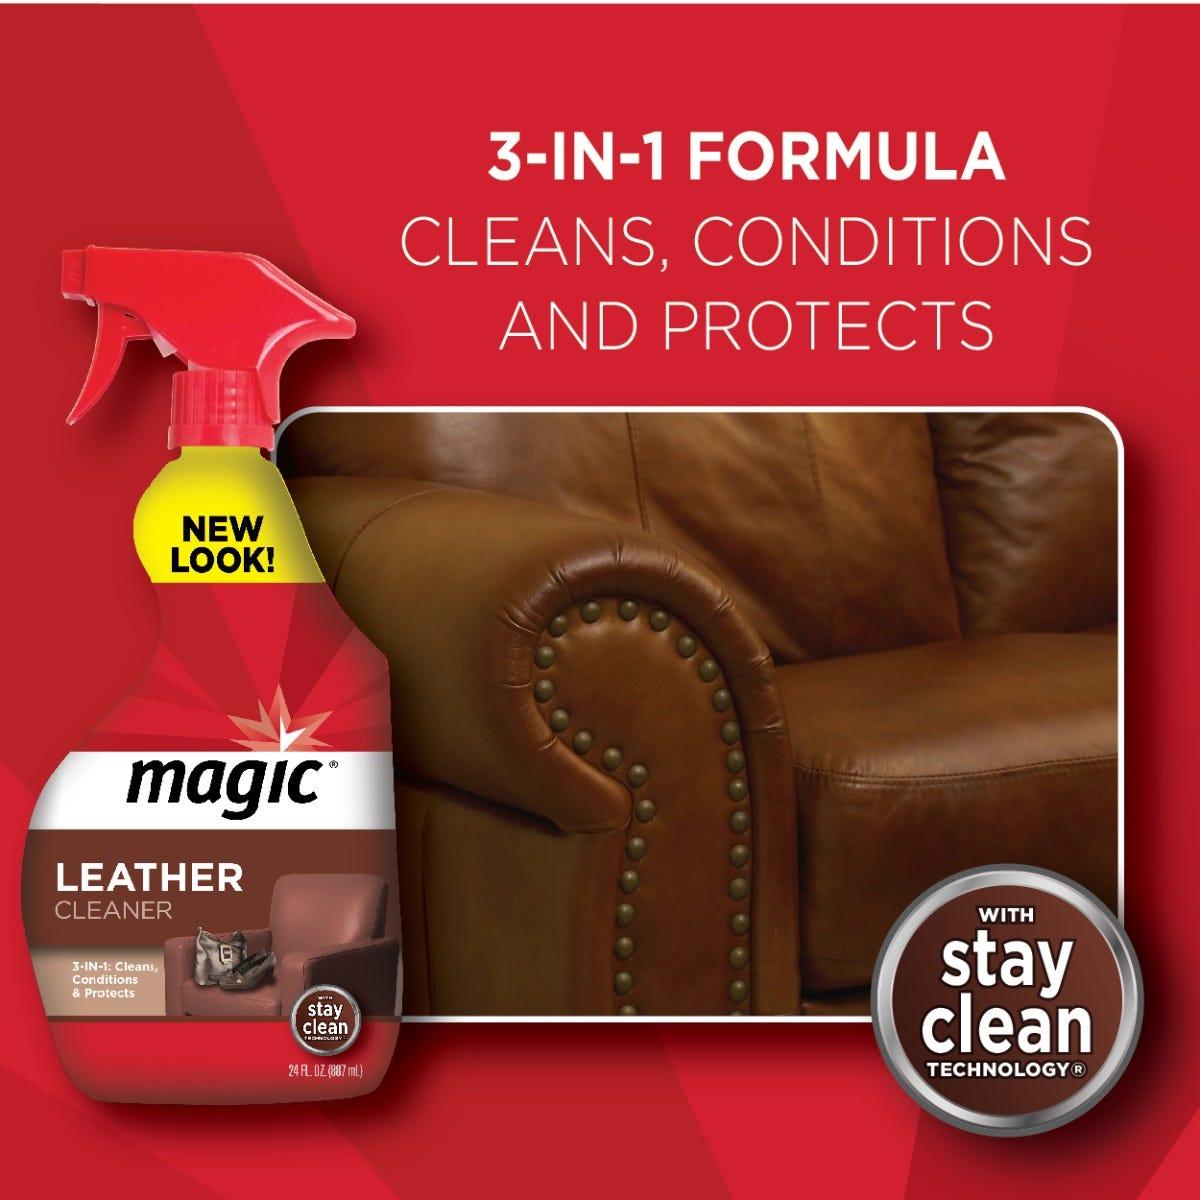 https://googone.com/media/catalog/product/m/a/magic_leather_cleaner_spray_beauty.jpg